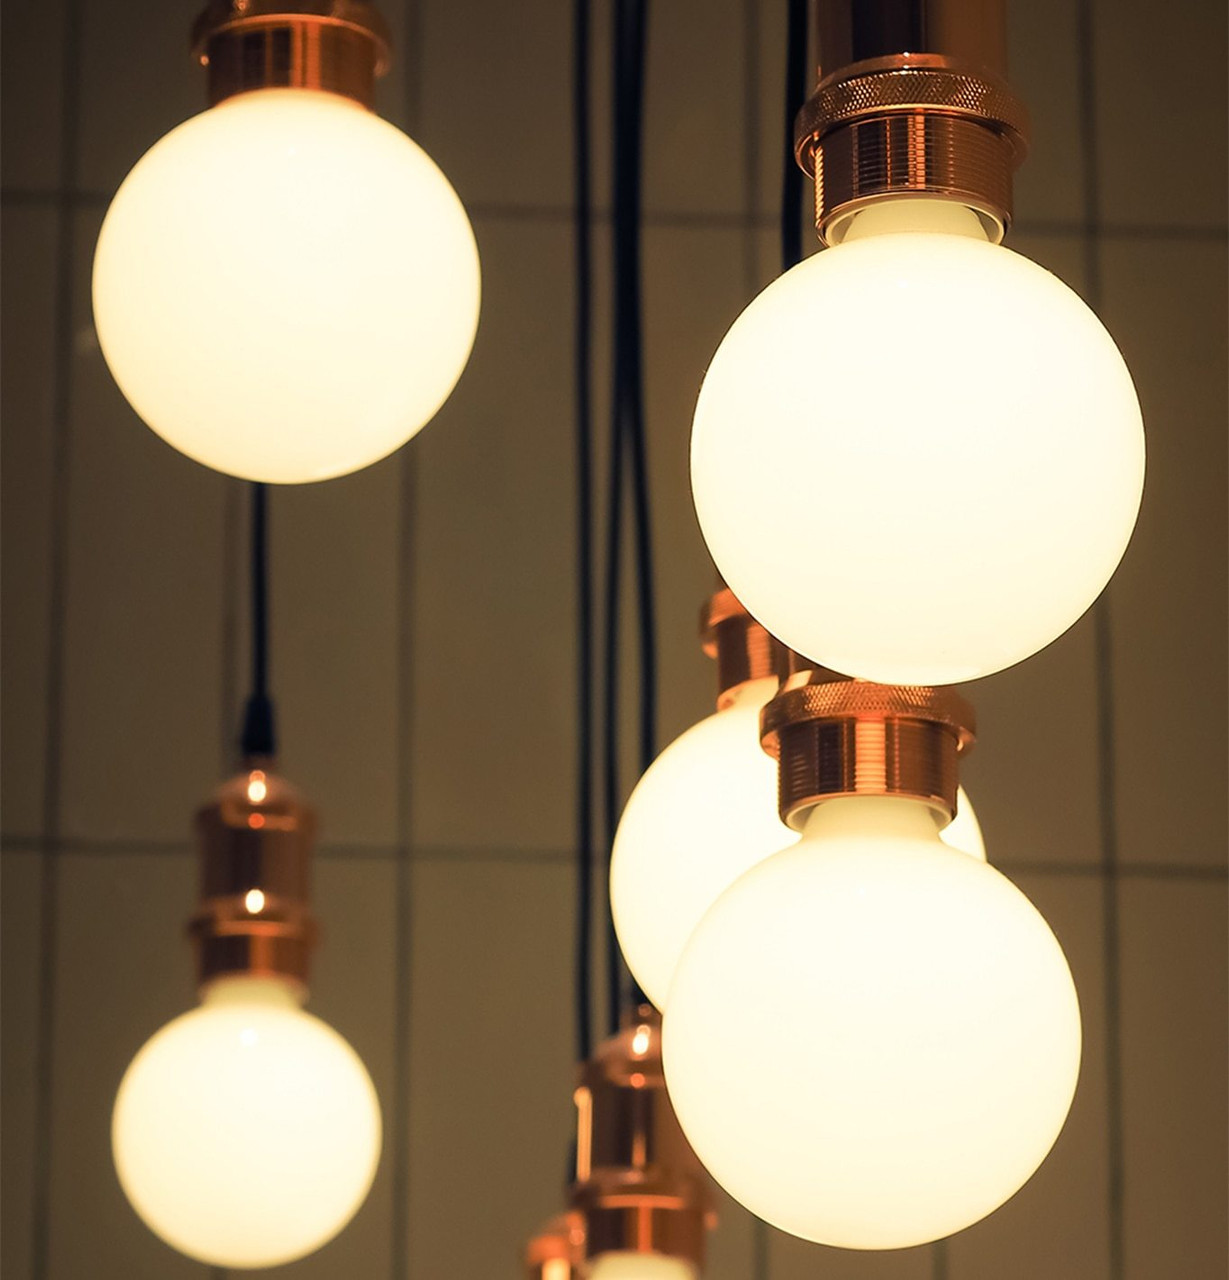 Crompton Lamps LED Globe IP20 Light Bulbs